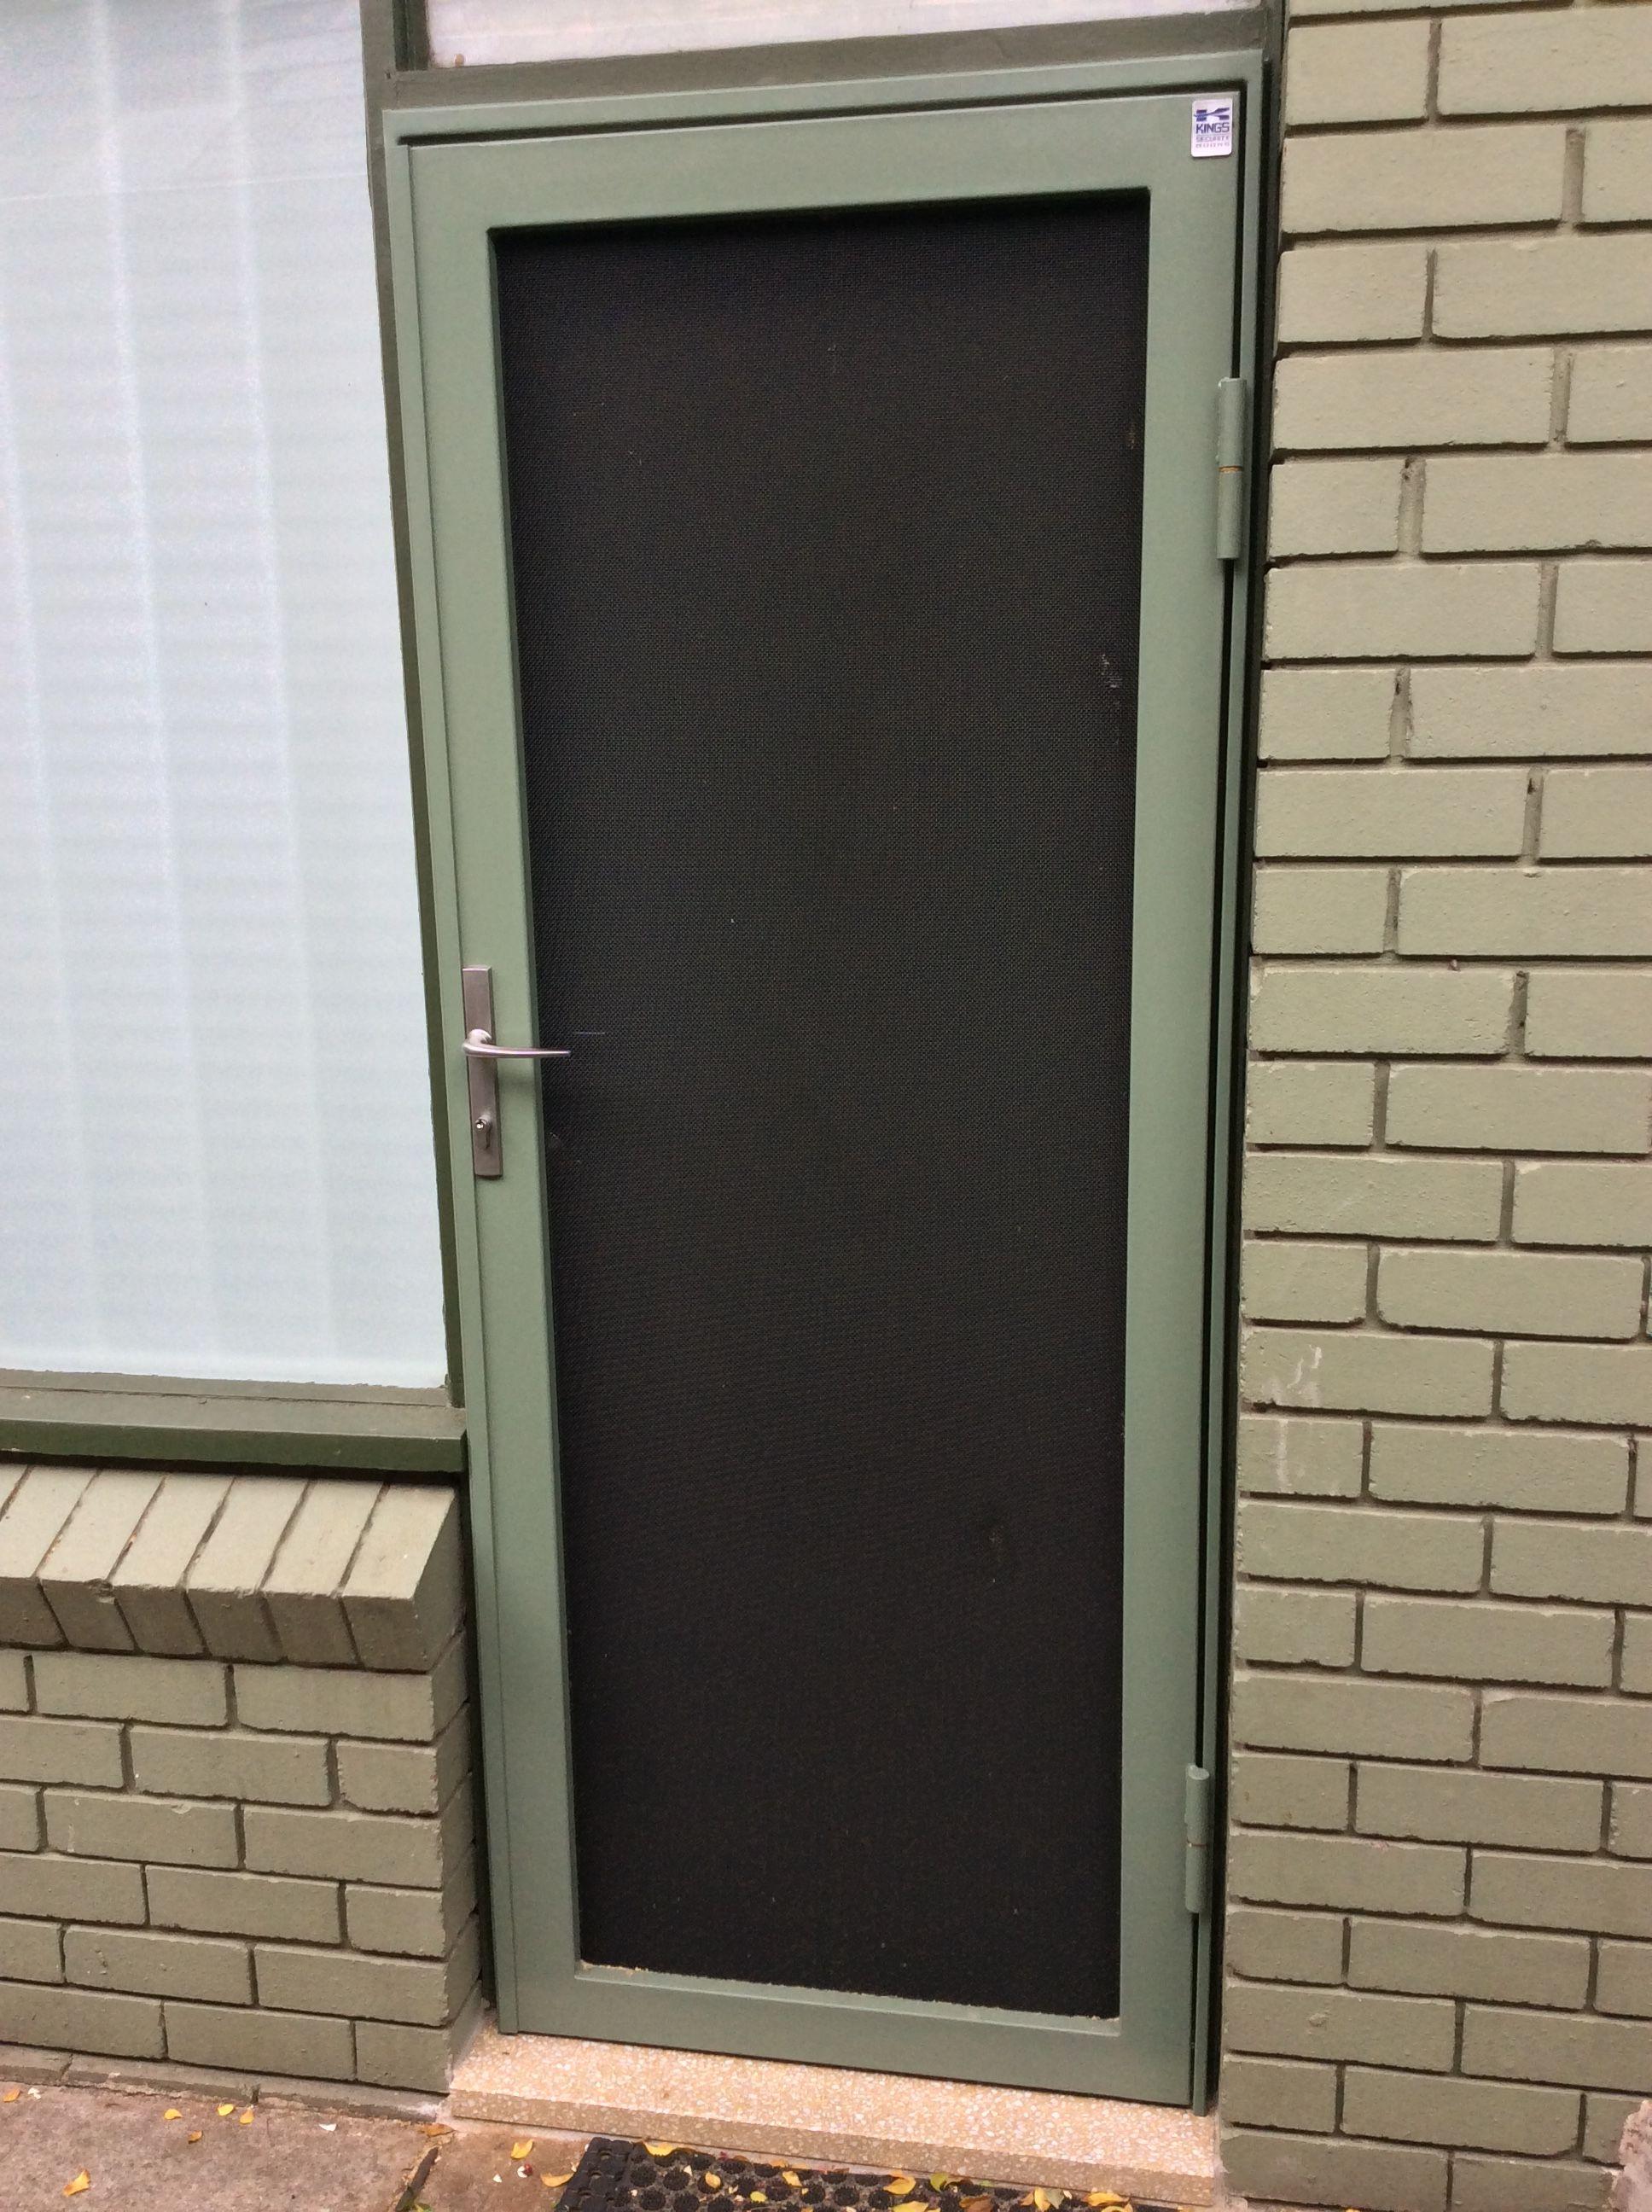 Kingsafe Ultimate Door Made By Kings Security Doors Beats Any Screen